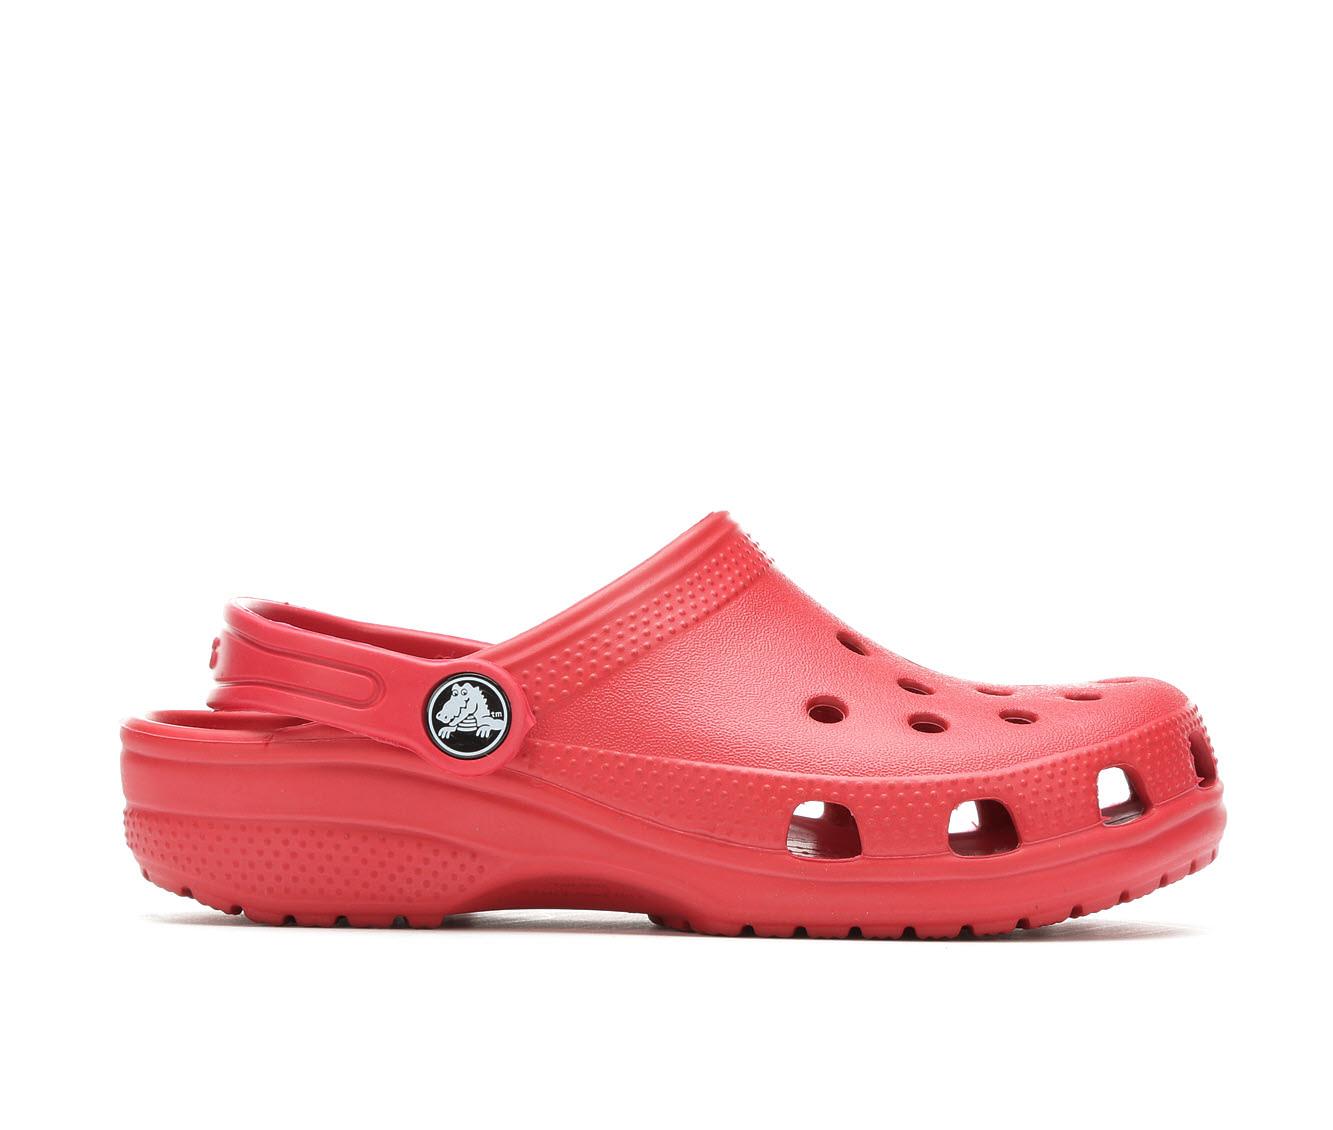 Girls' Crocs Infant Classic Clog Children's Shoes (Red)